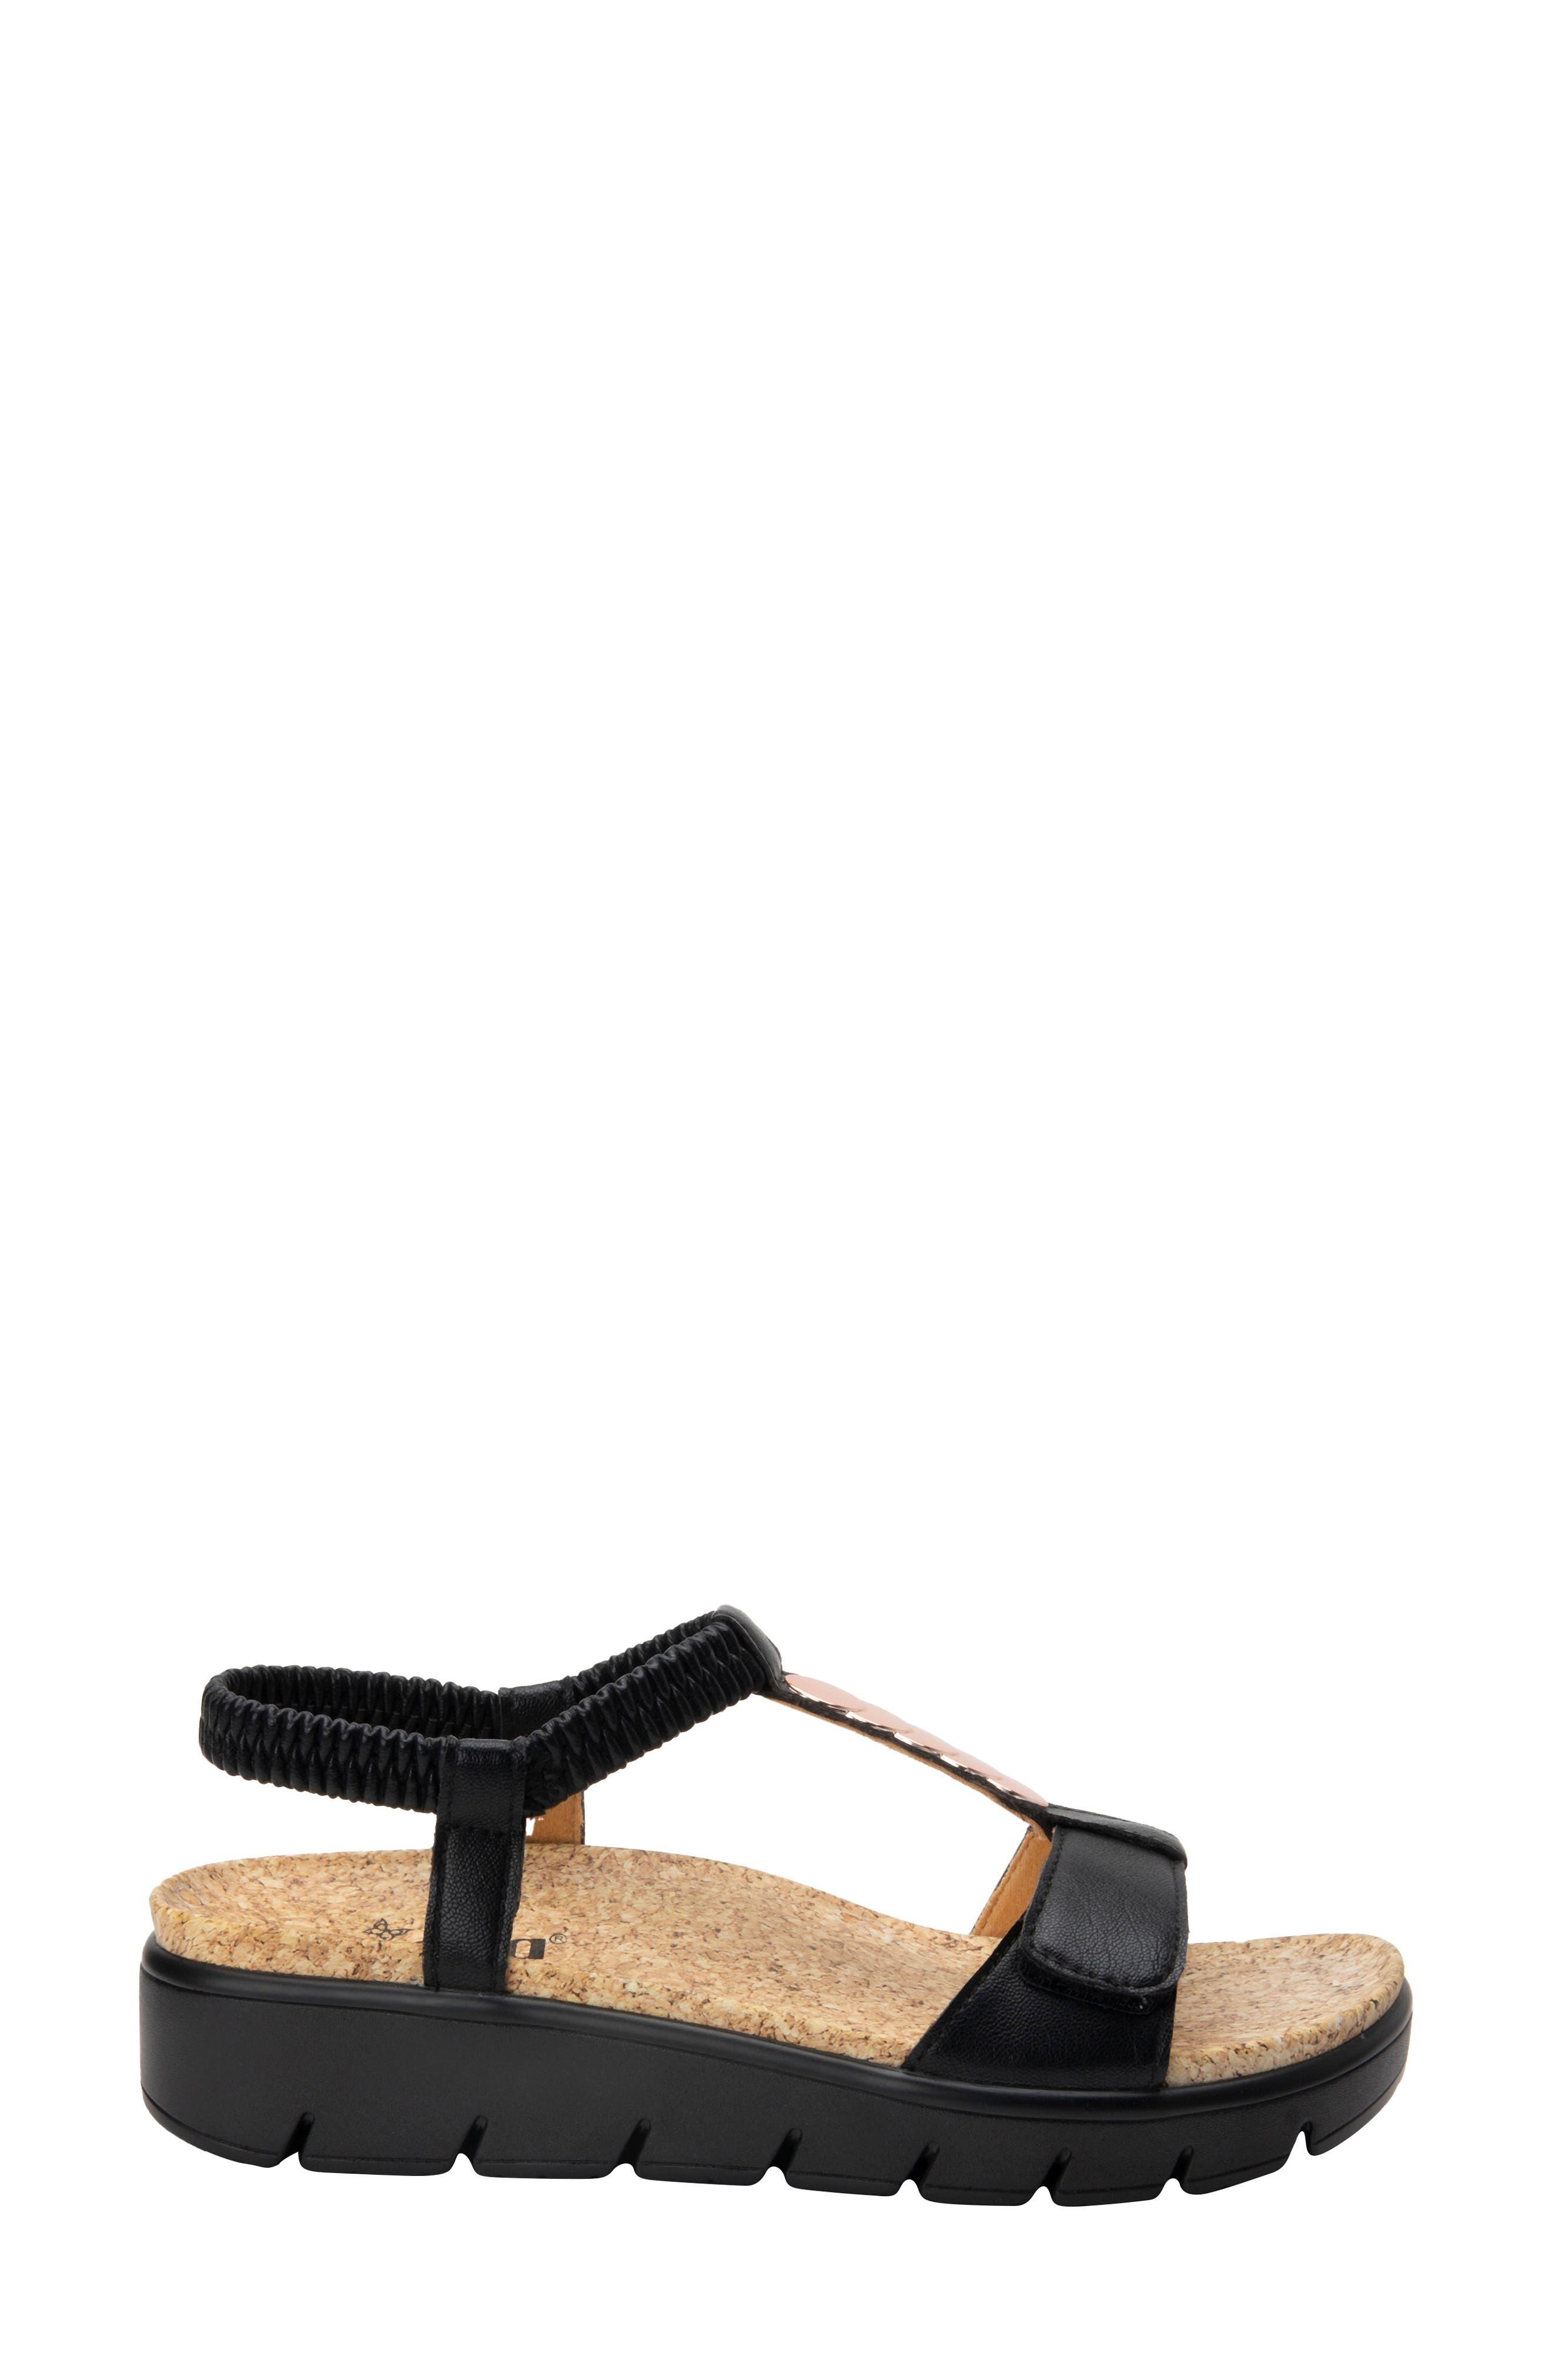 Women's Alegria Harlie T-Strap Sandal